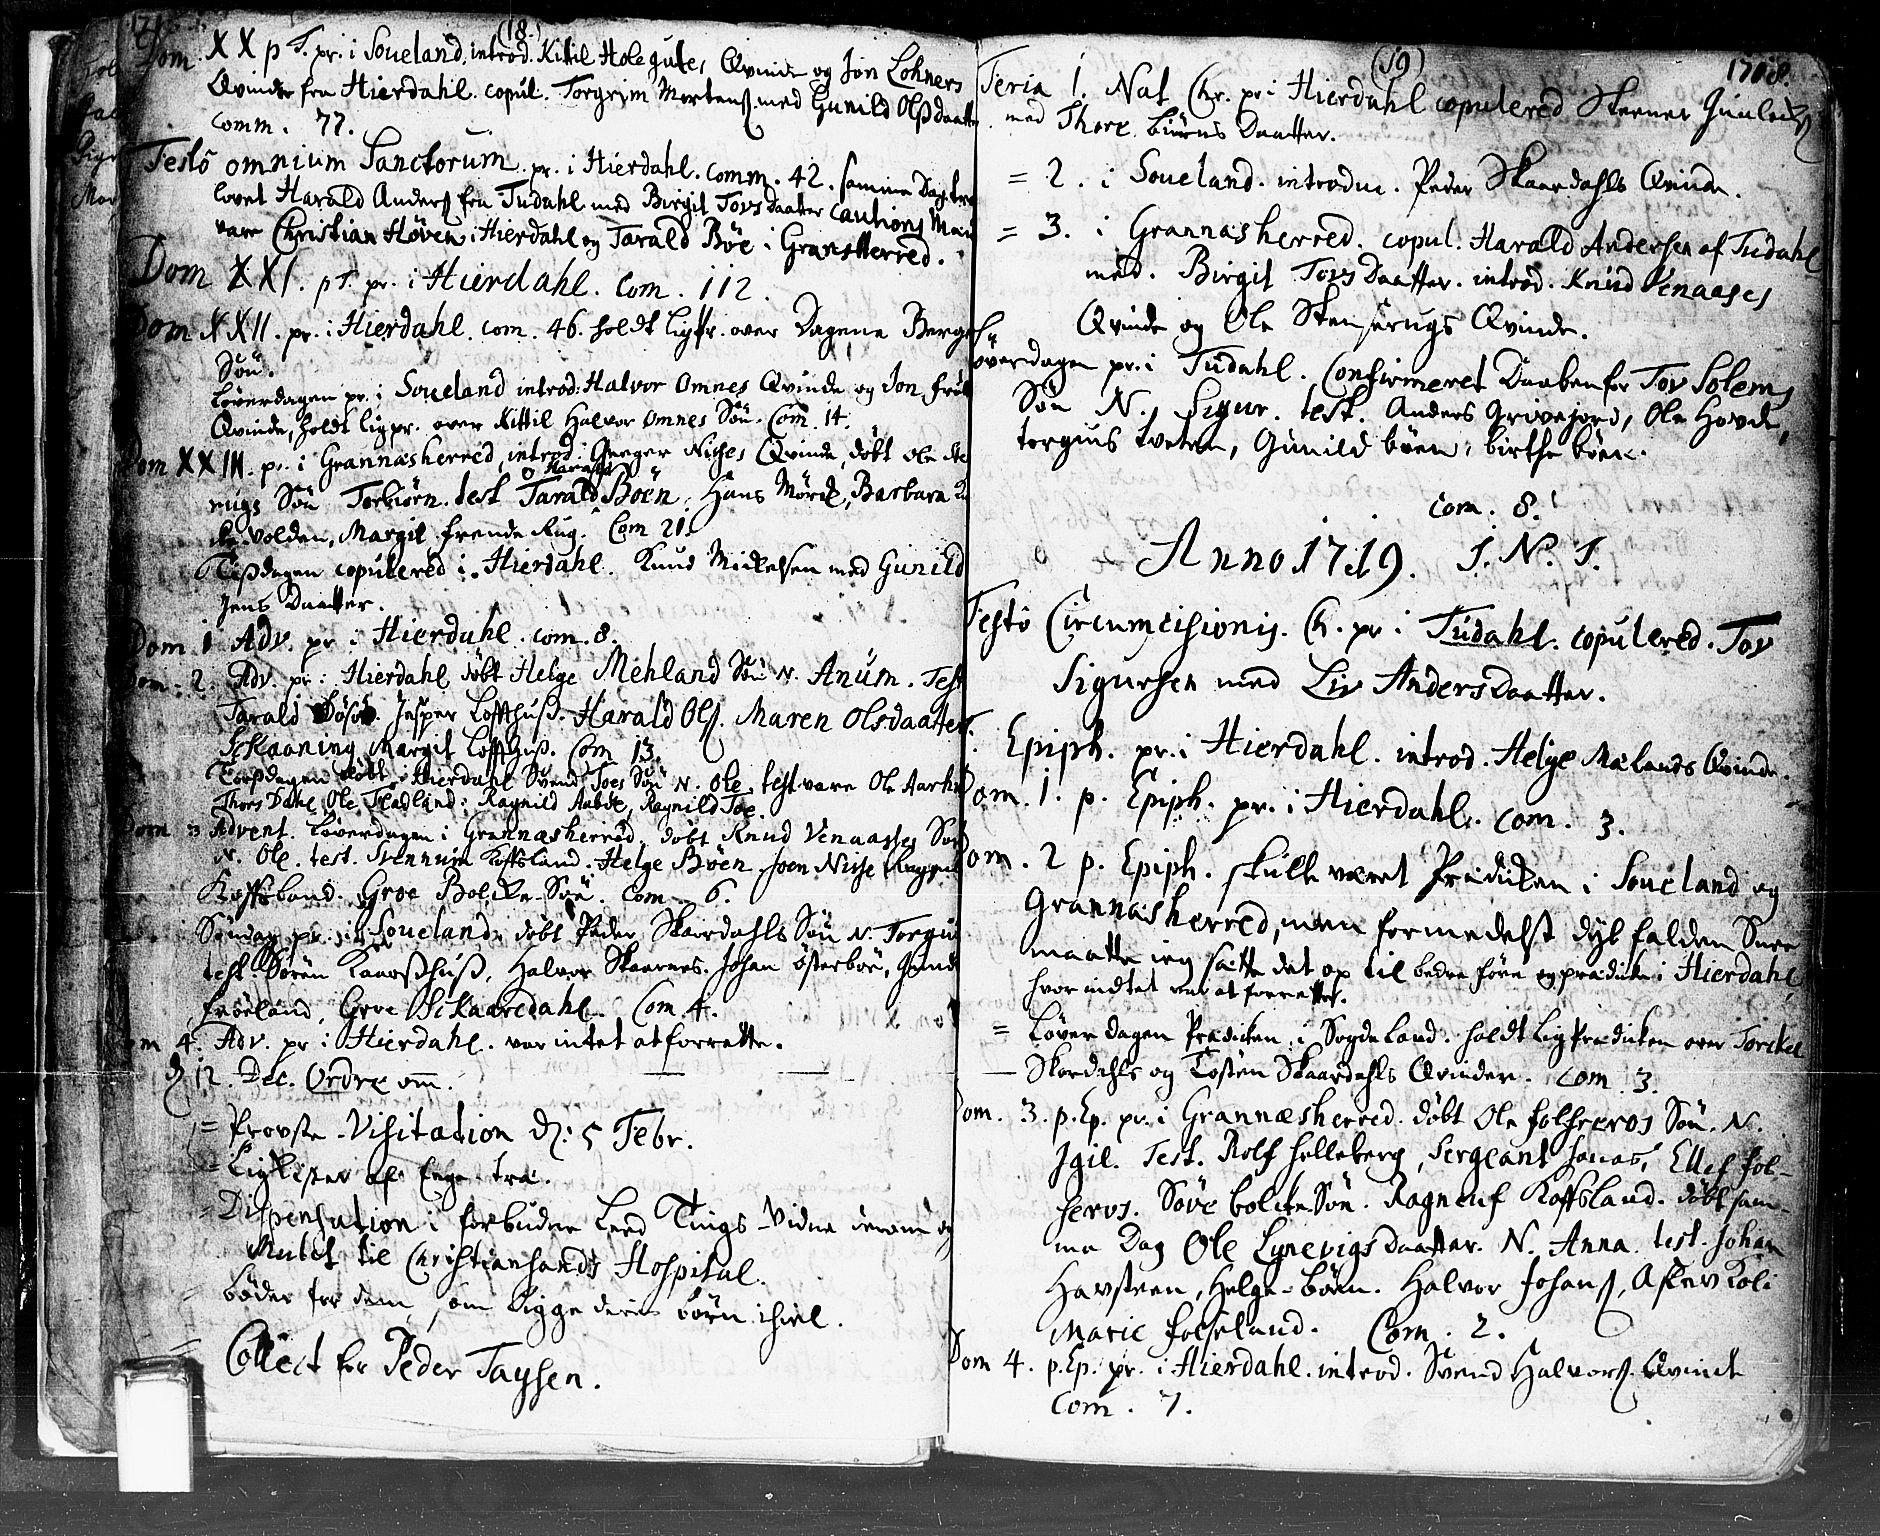 SAKO, Hjartdal kirkebøker, F/Fa/L0002: Ministerialbok nr. I 2, 1716-1754, s. 18-19